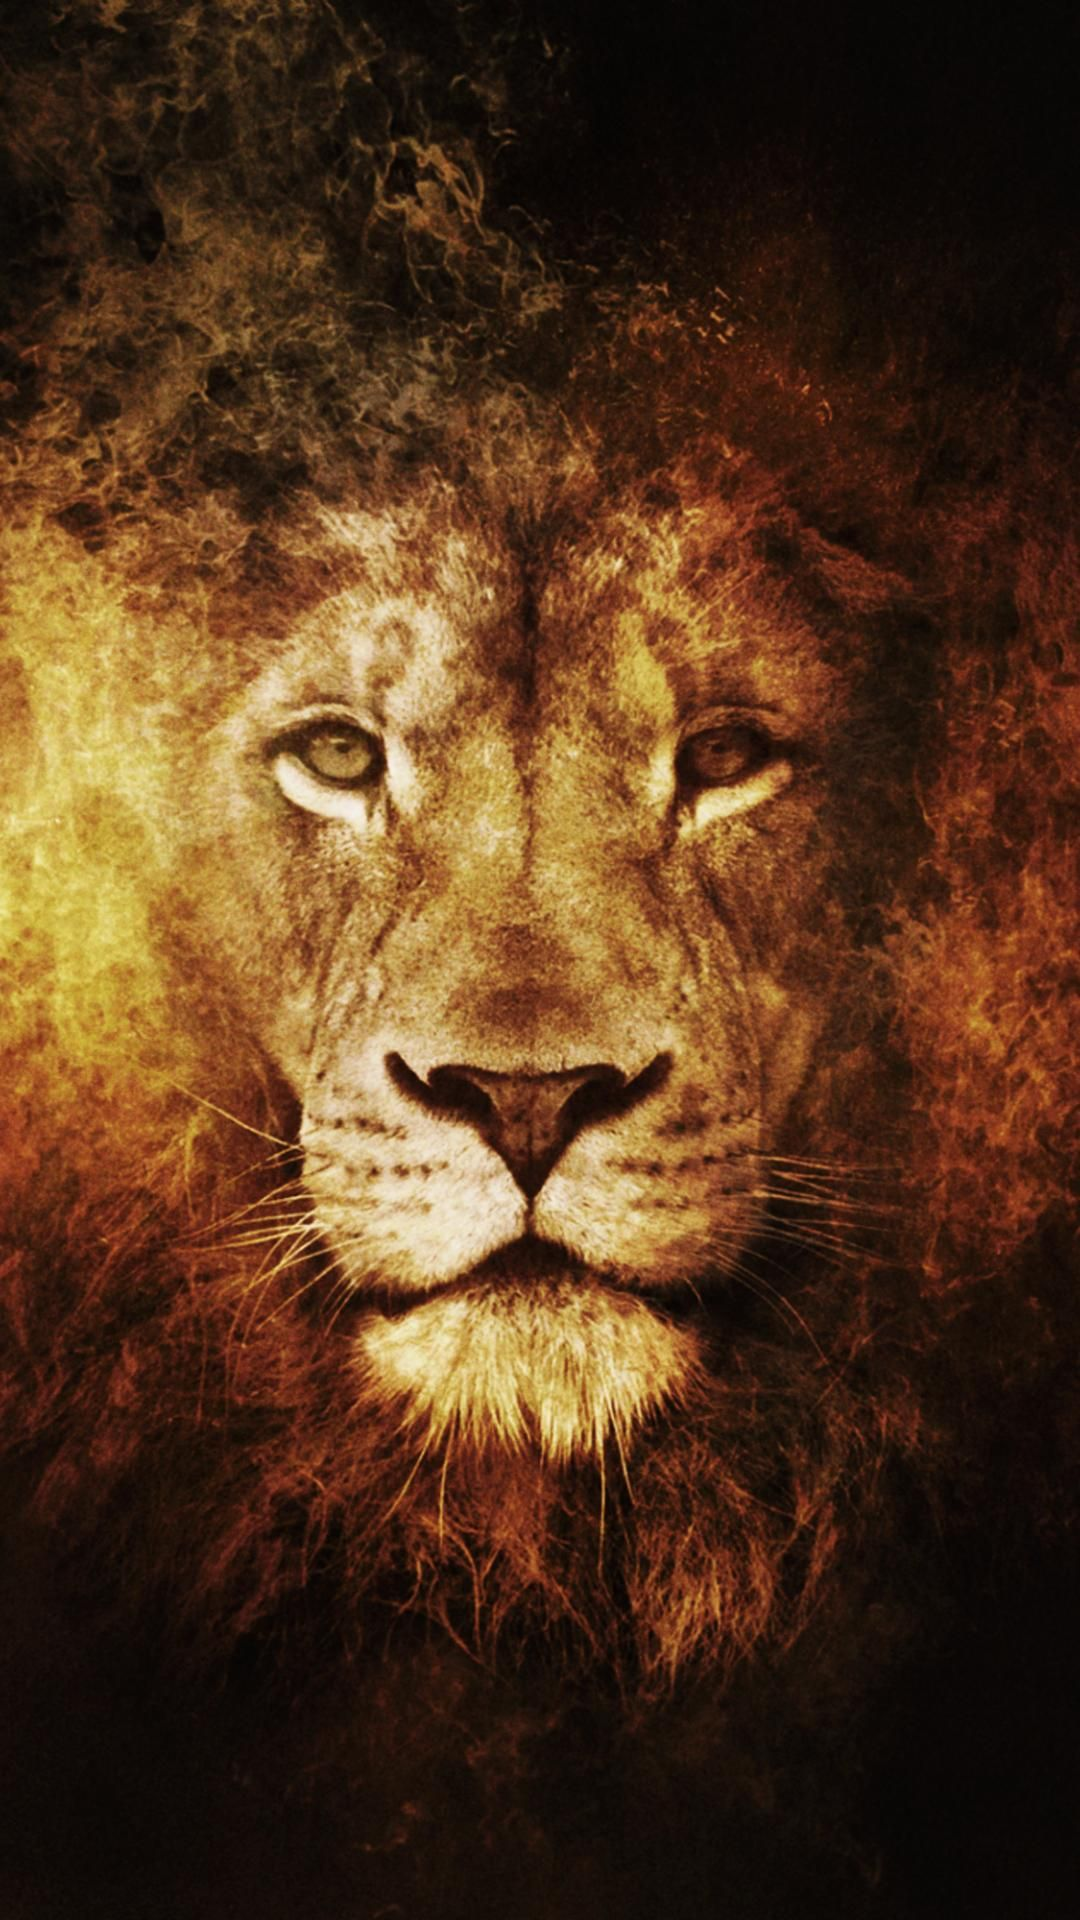 Iphone wallpaper tumblr lion - Lion Wallpaper Hd Animals Lion Iphone 6 Plus Wallpaper